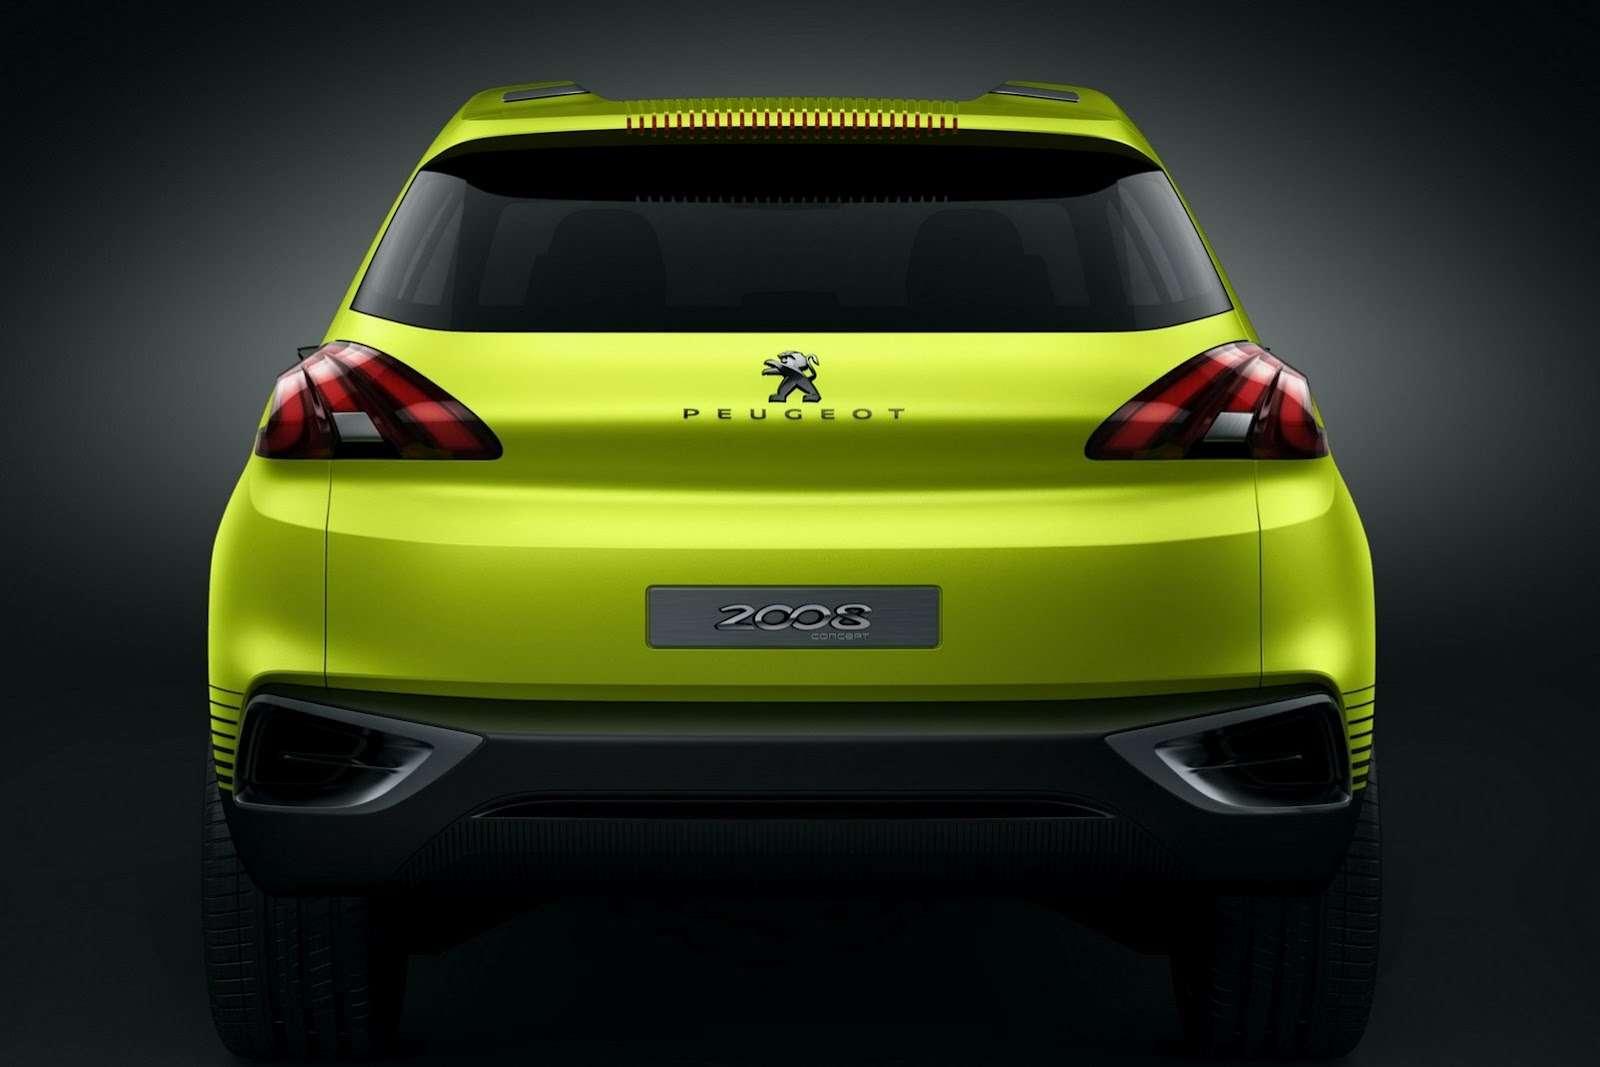 _no_copyright_Peugeot-2008-Concept-2